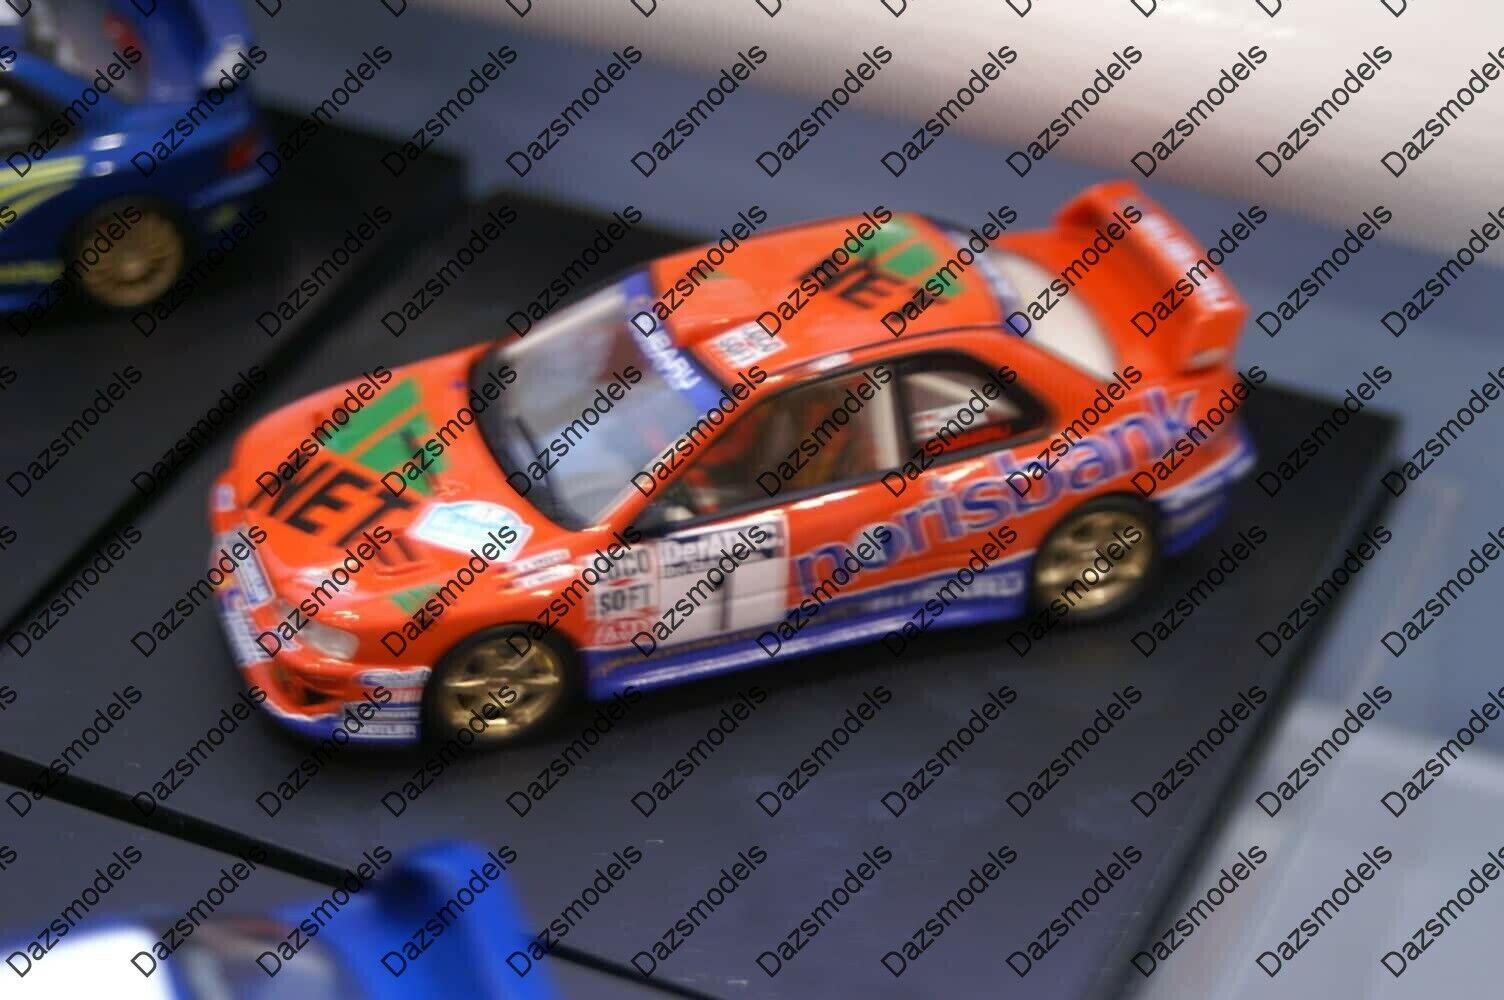 Trofeu Subaru Impreza Adac Rally 2000  A.Kremer Fis.07